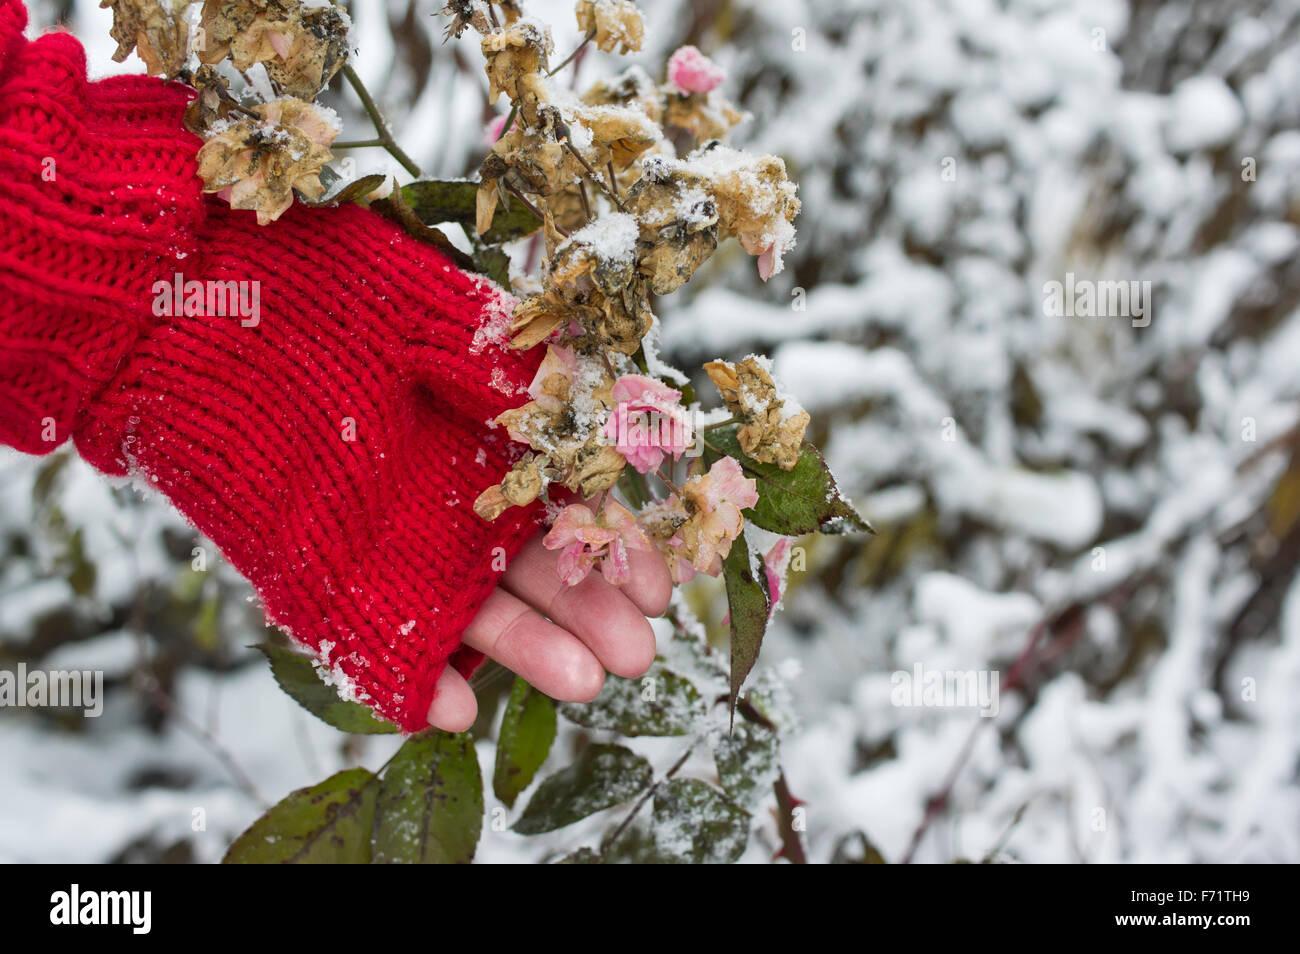 Frozen Roses Bush - Stock Image